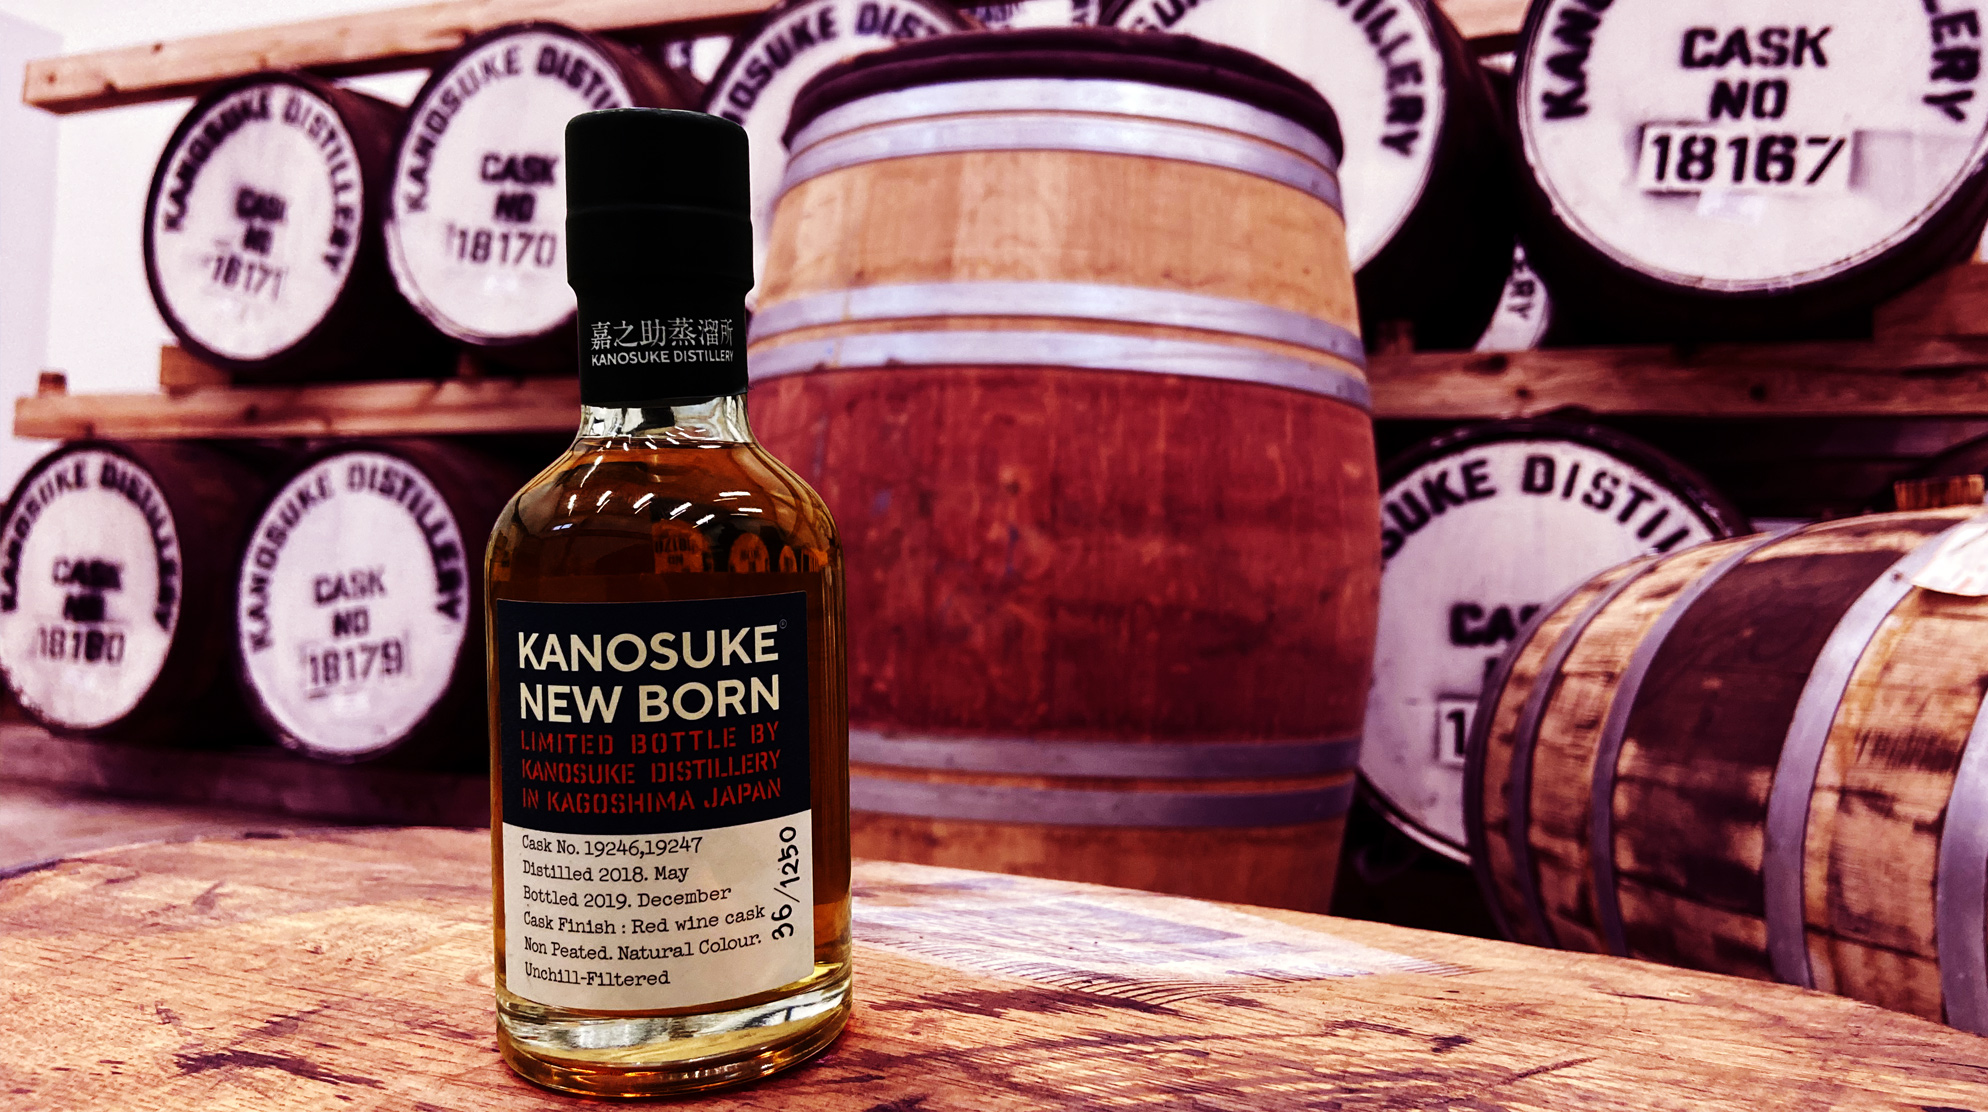 NEW BORN 嘉之助蒸溜所限定ボトル